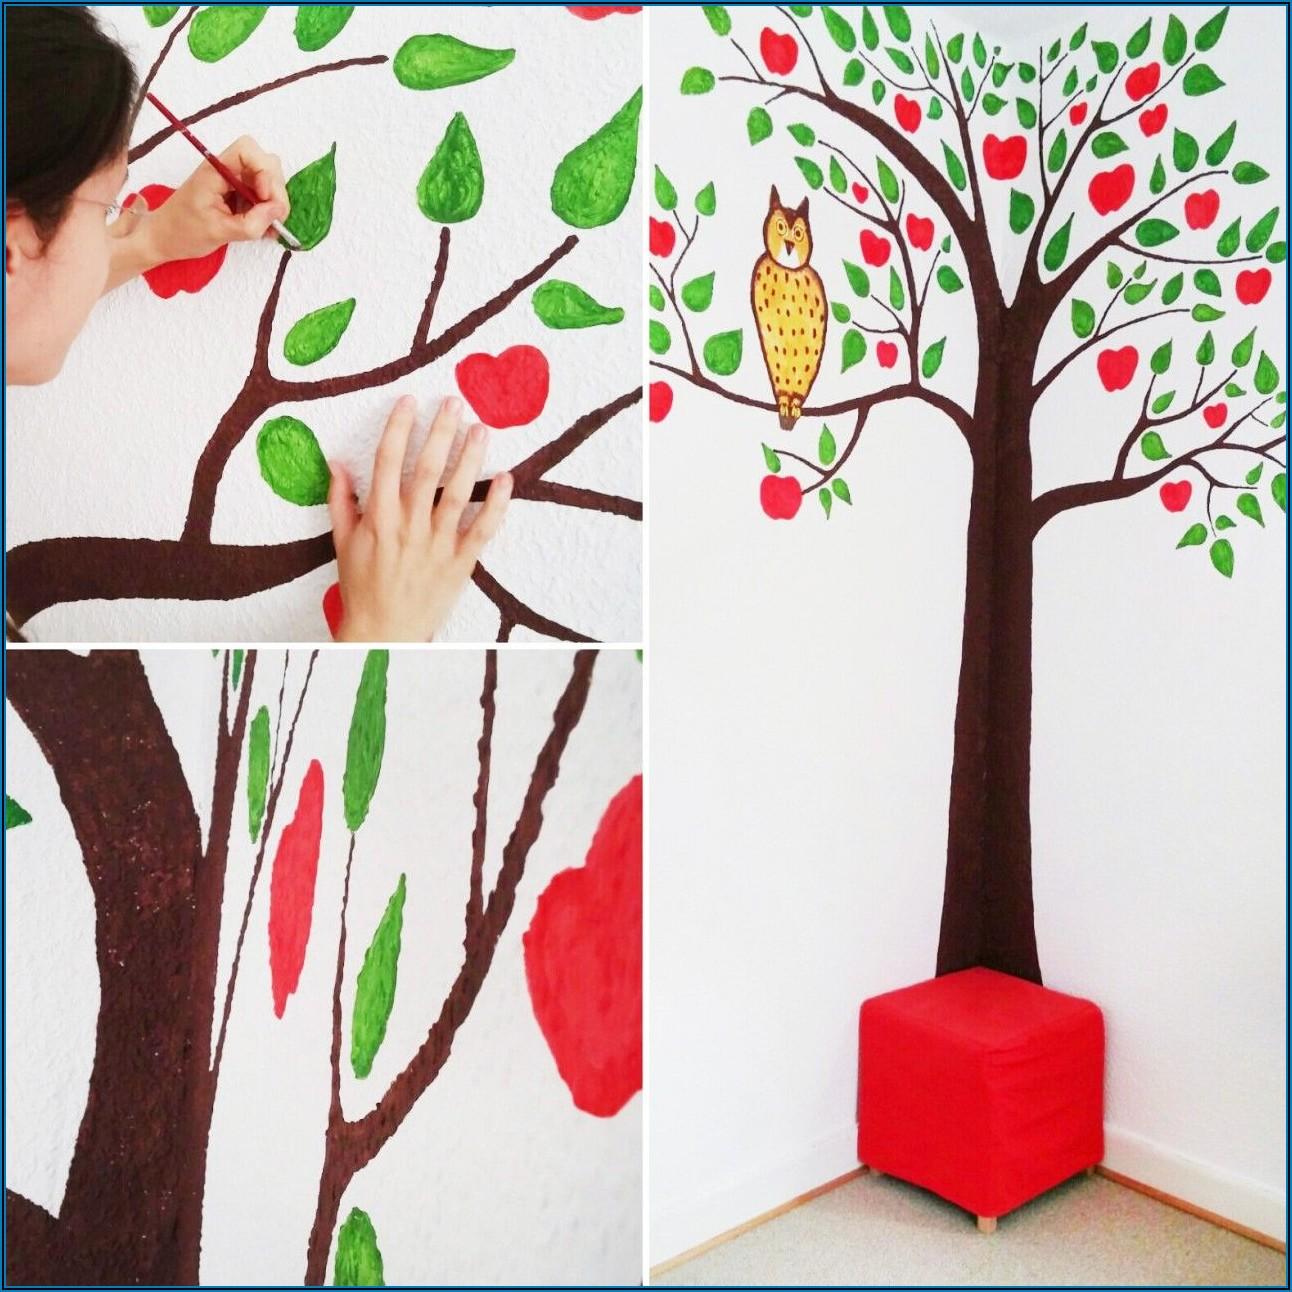 Wand Im Kinderzimmer Bemalen